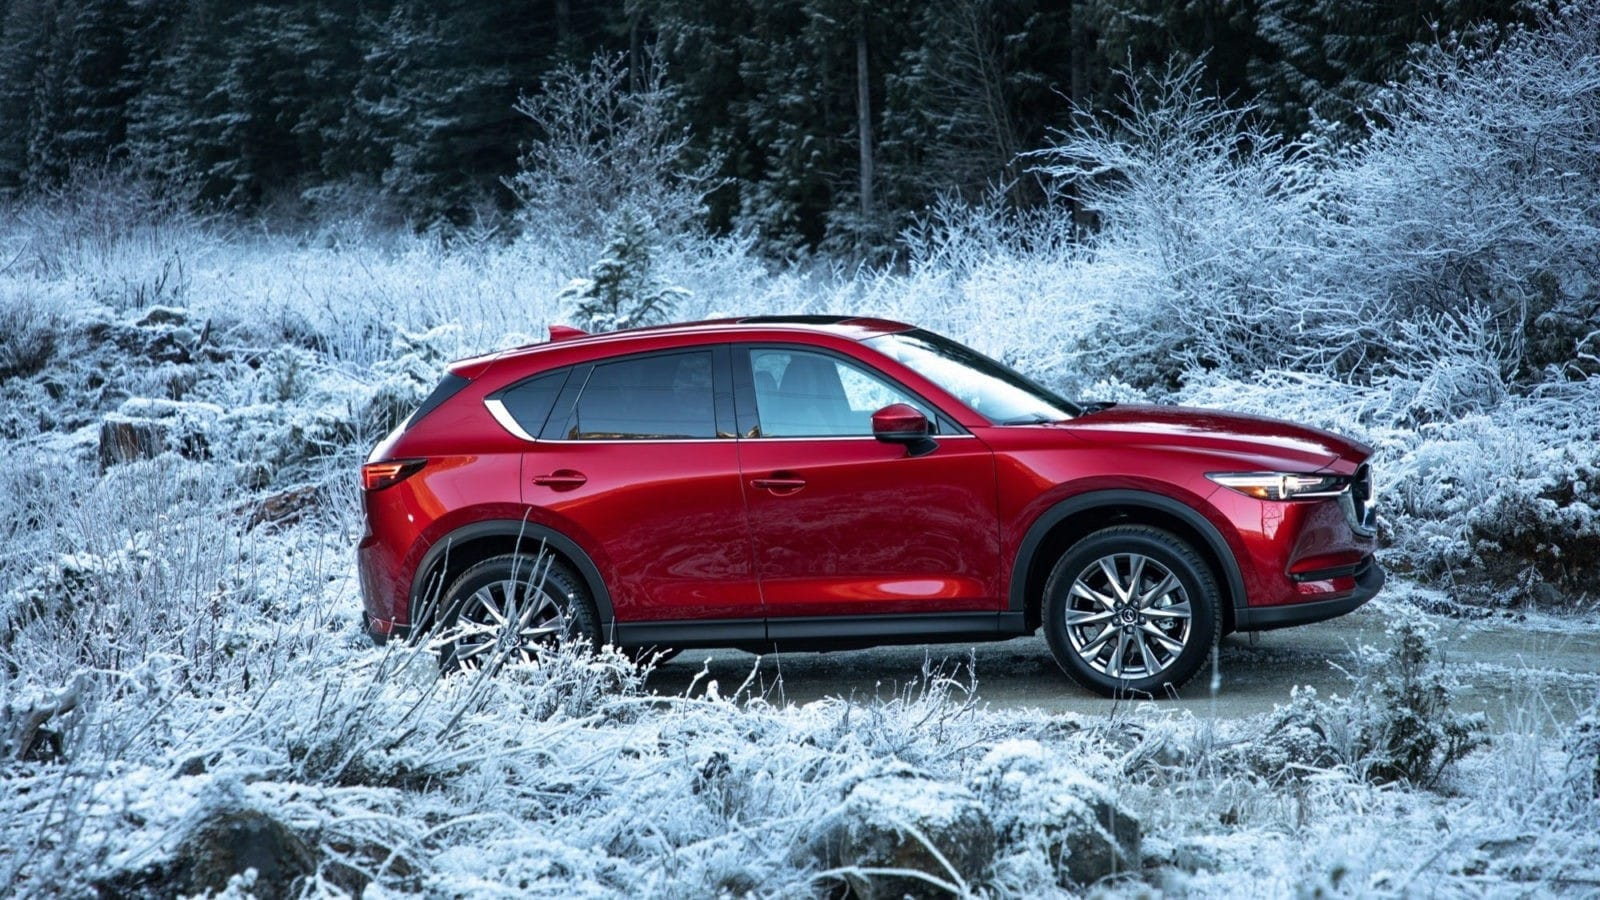 2021 Mazda CX-3 характеристики и цена